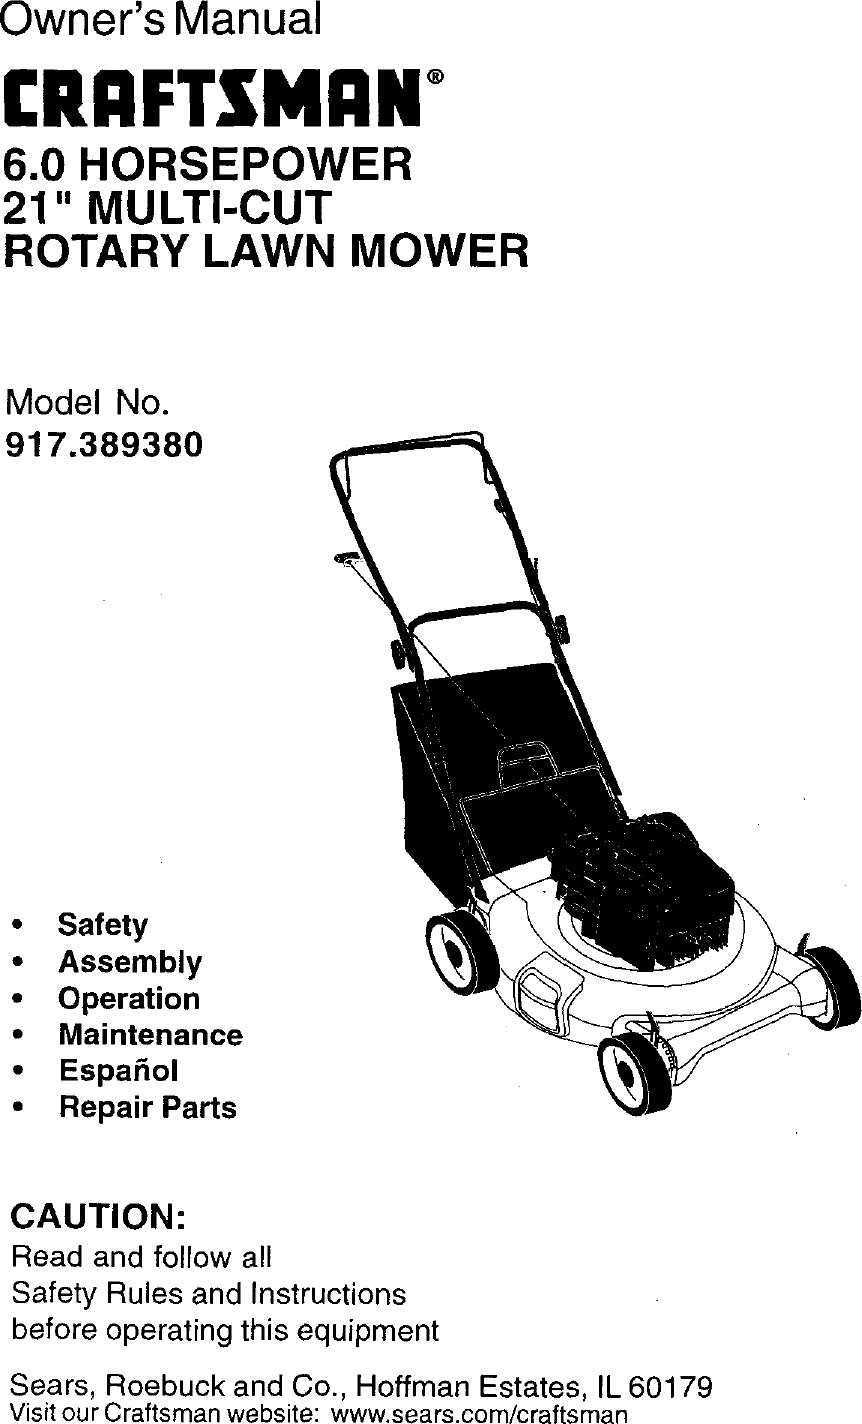 Craftsman 917389380 User Manual Gas, Walk Behind Lawnmower